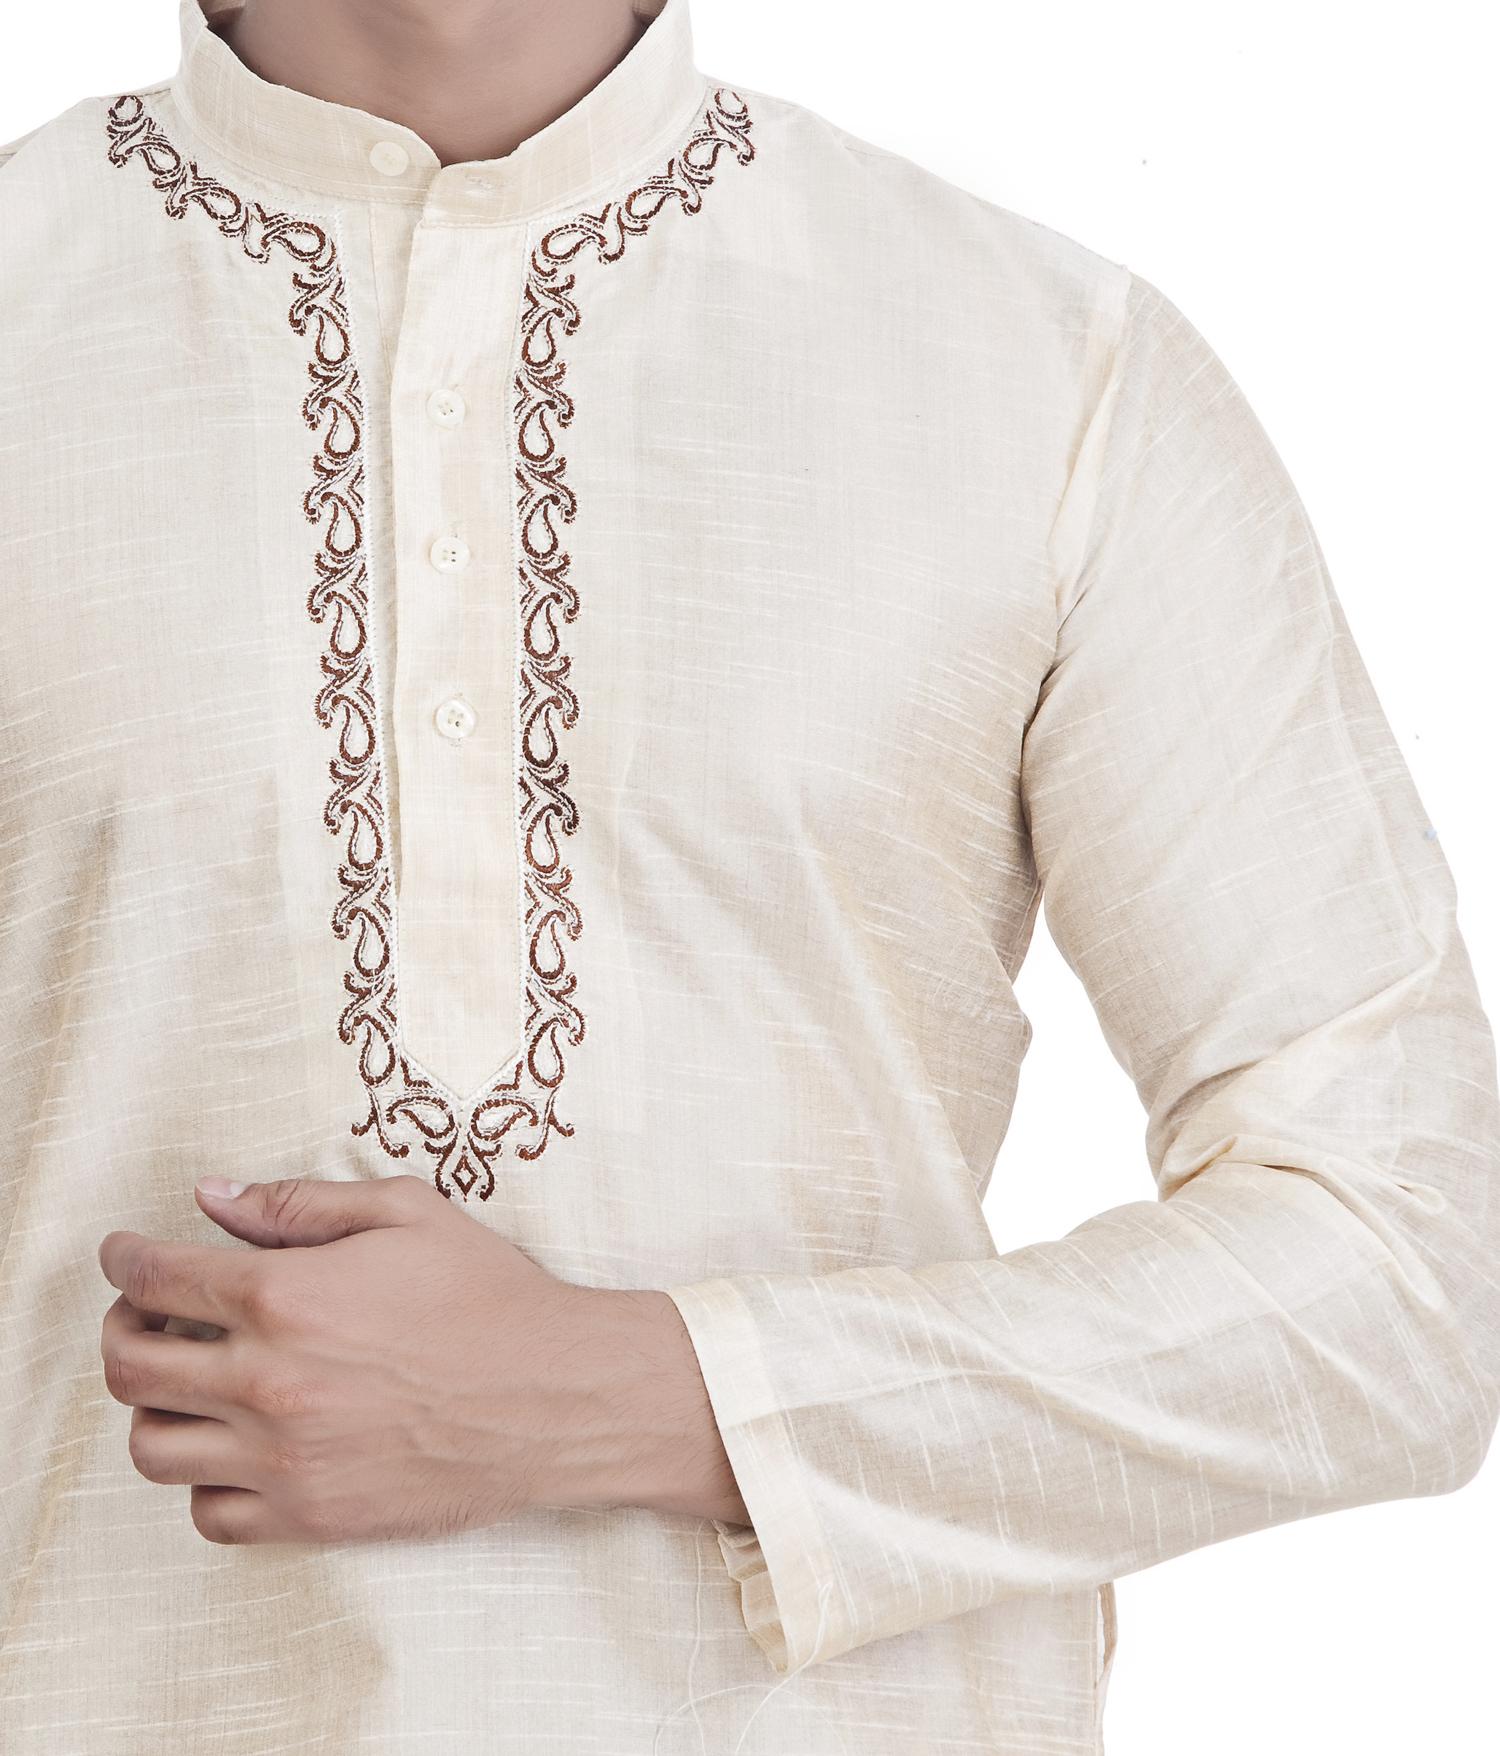 Ethnava Hand Embroidered Fancy Lucknowi Chikan Kurta